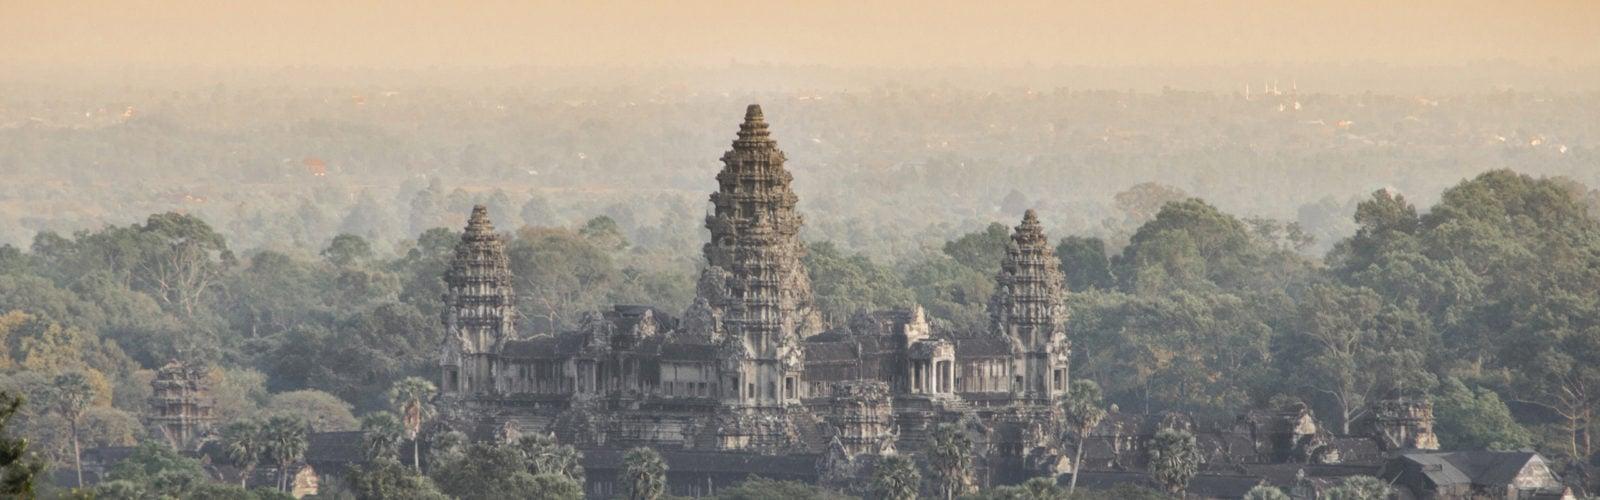 angkor-wat-dusk-cambodia